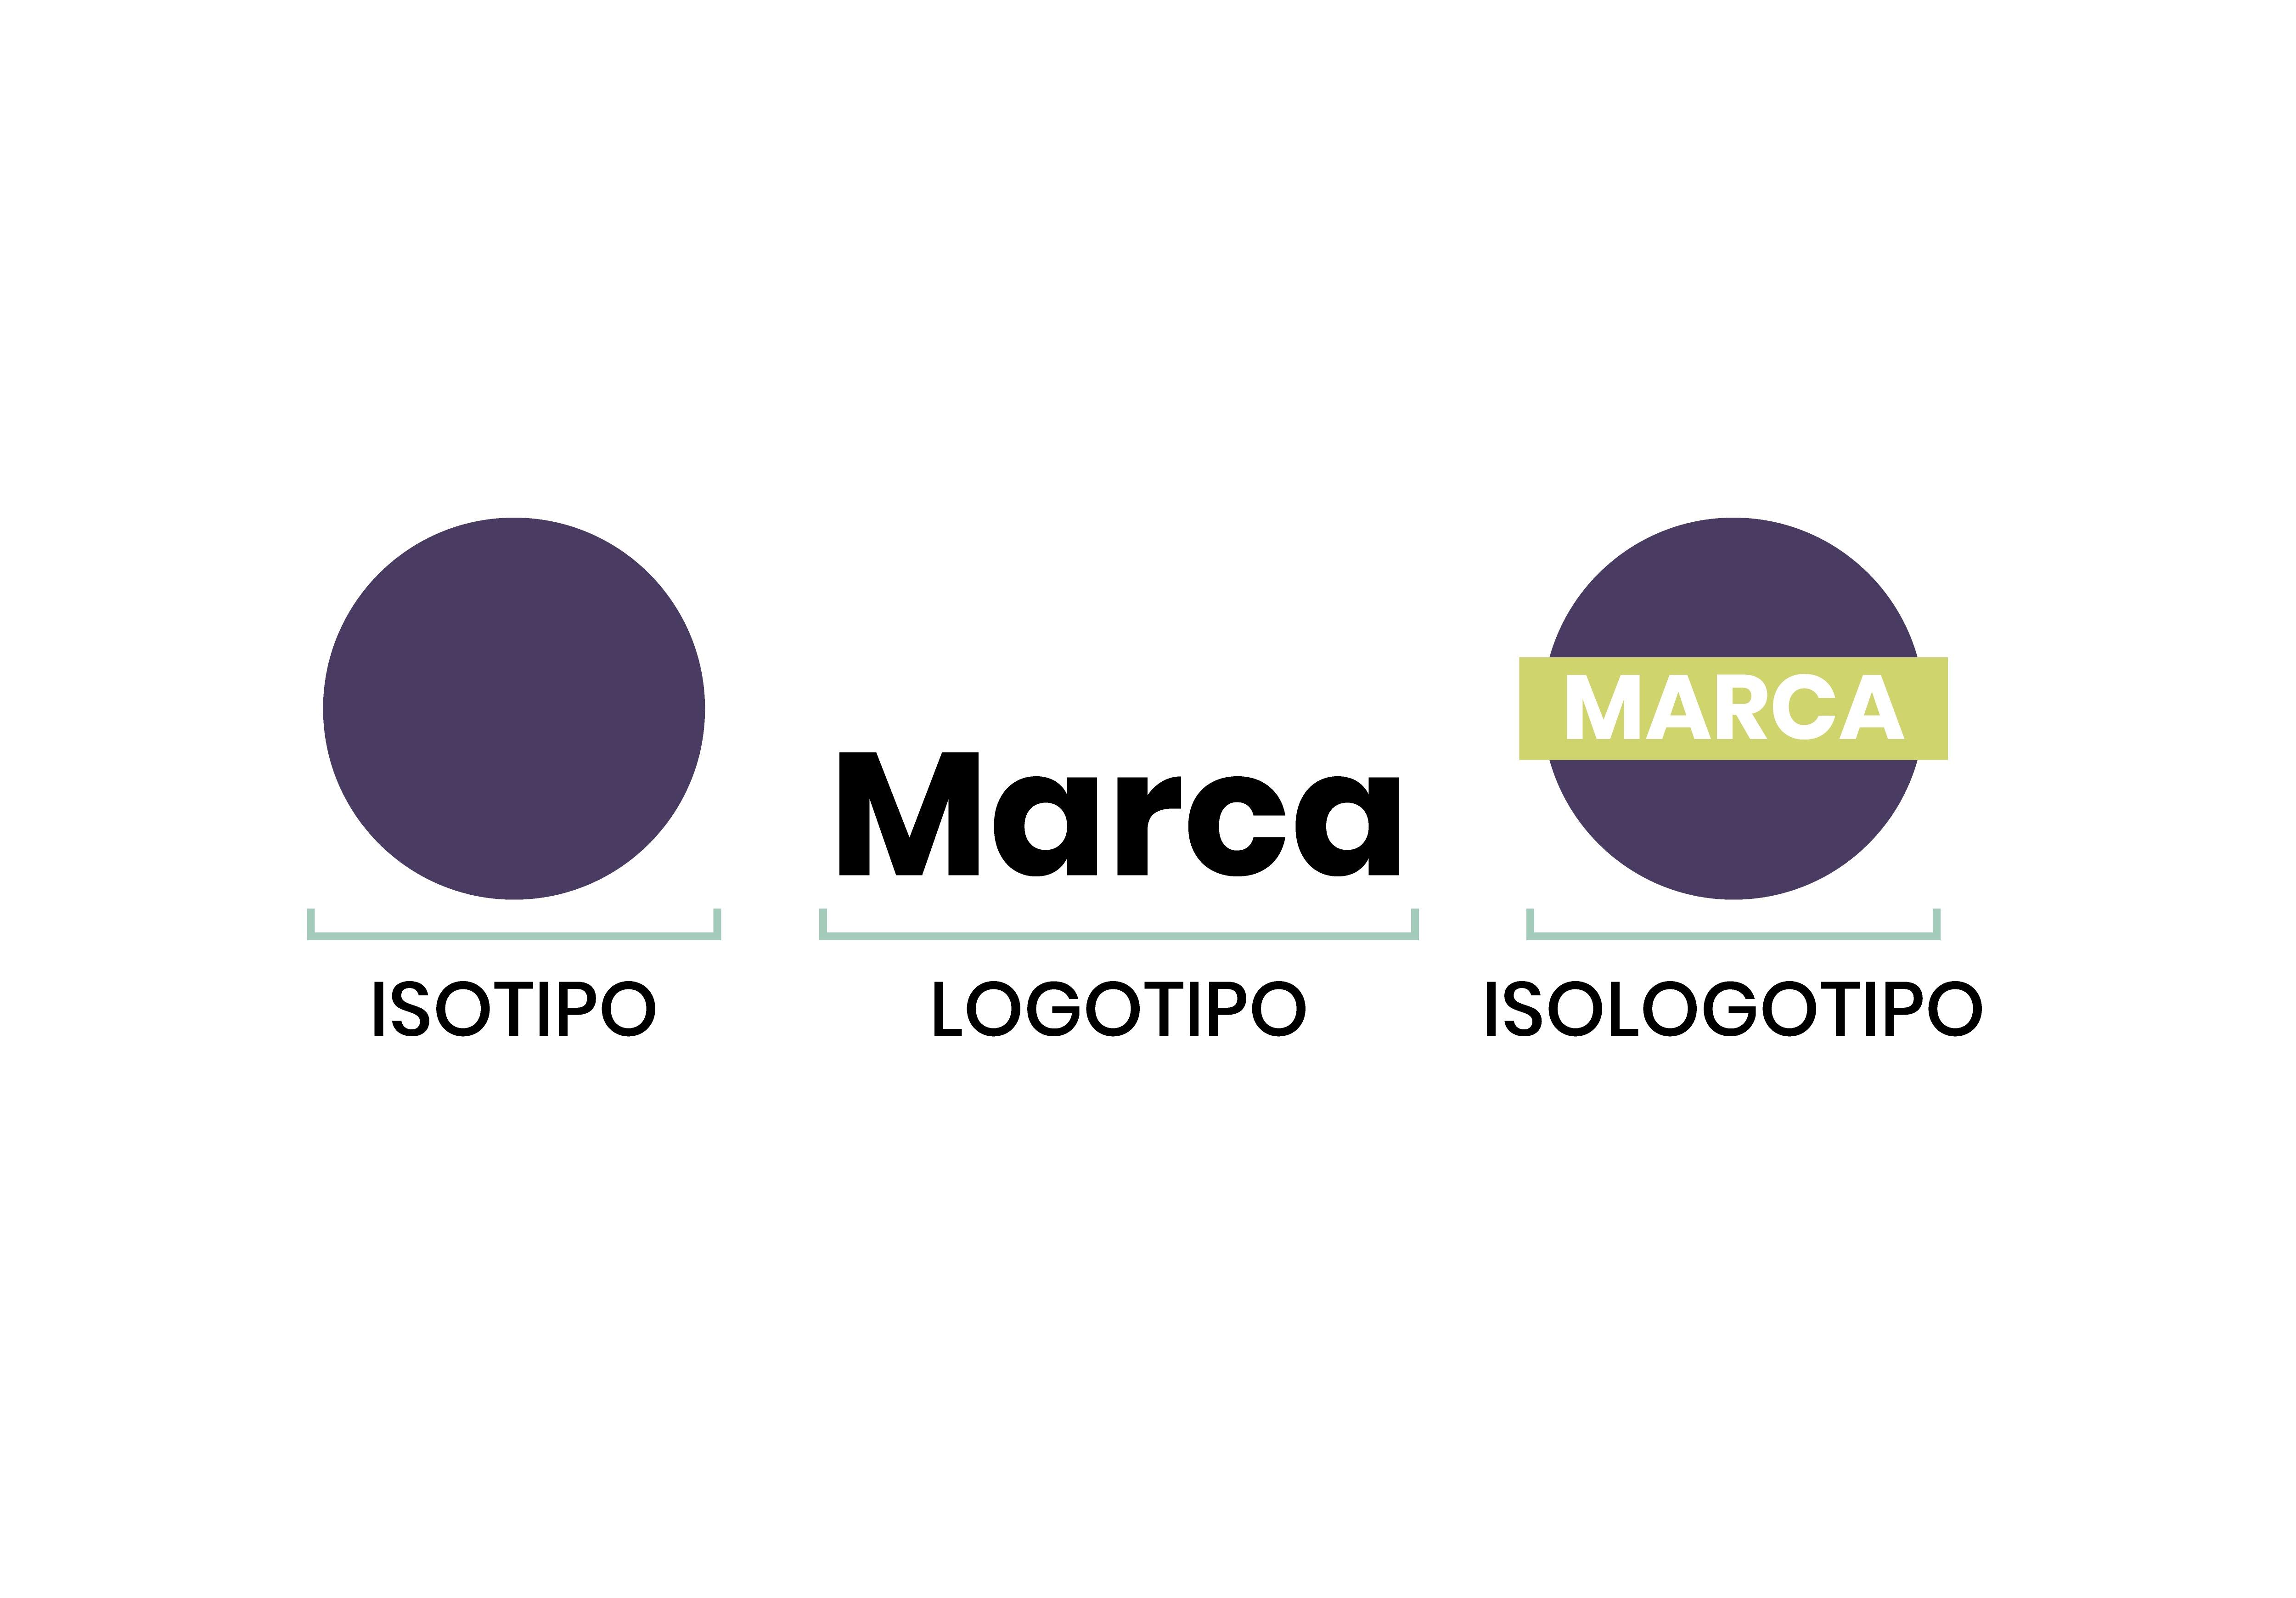 Marketing Digital Agencia Digital, Logo Design, diseno_de_logotipo_mejor_digital_5